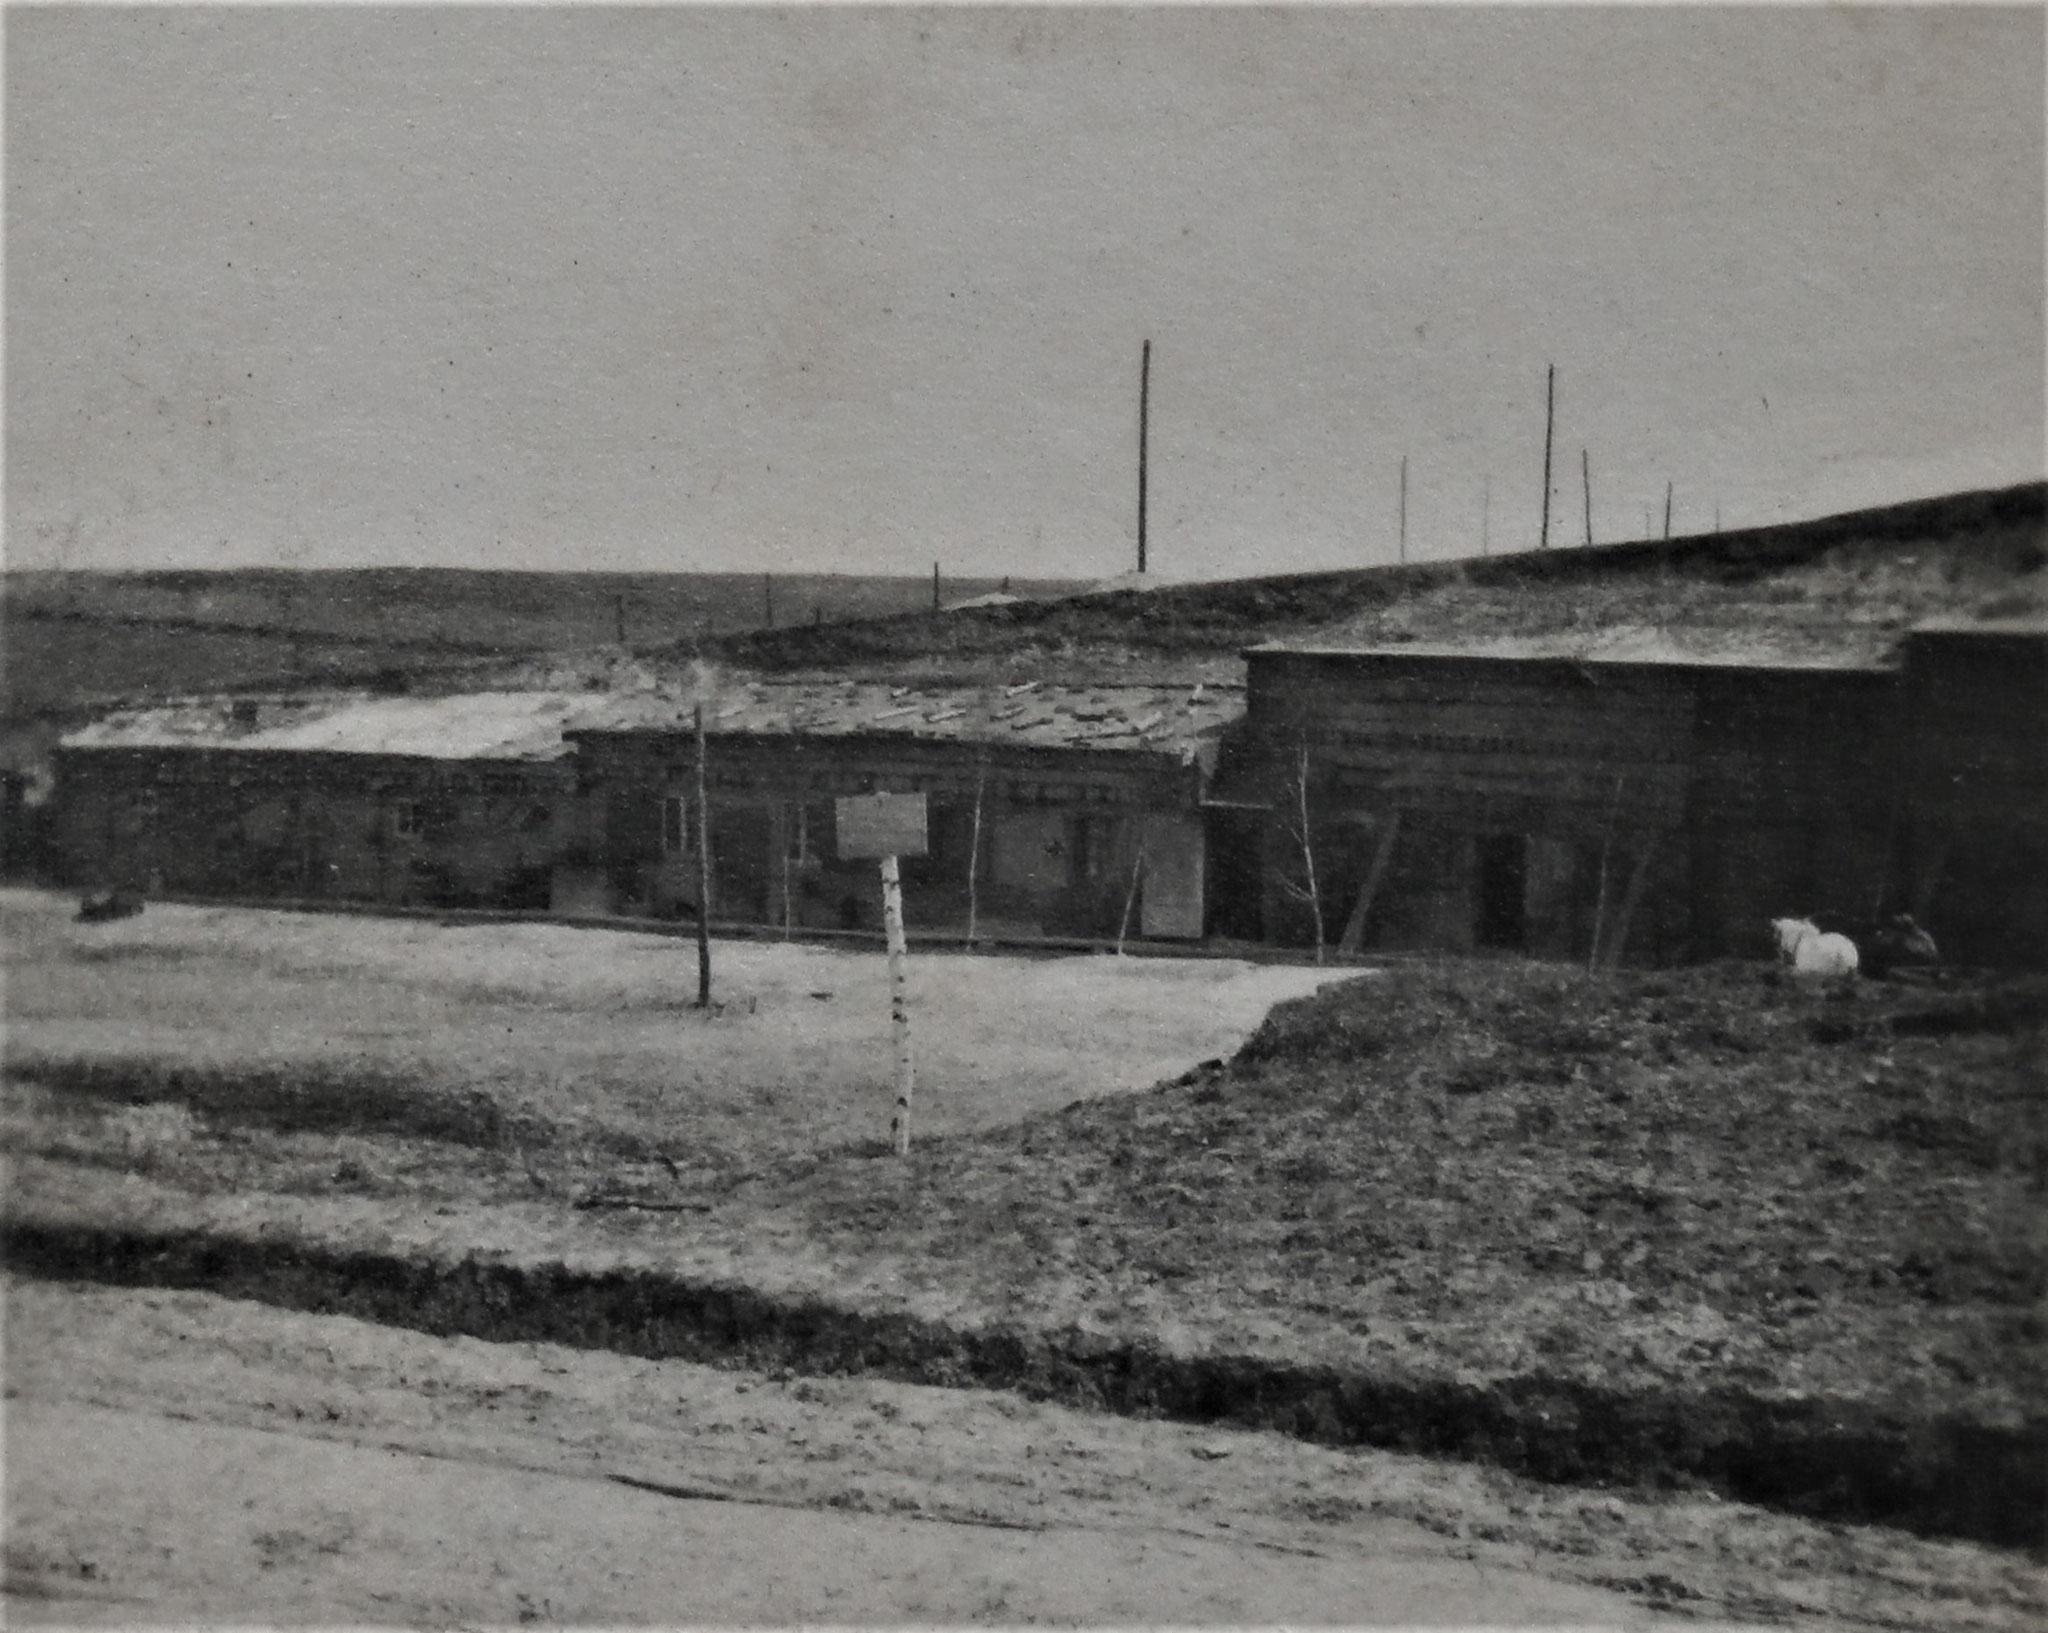 1917 Rgtkomdo Sandgrube westl. Wysocko.